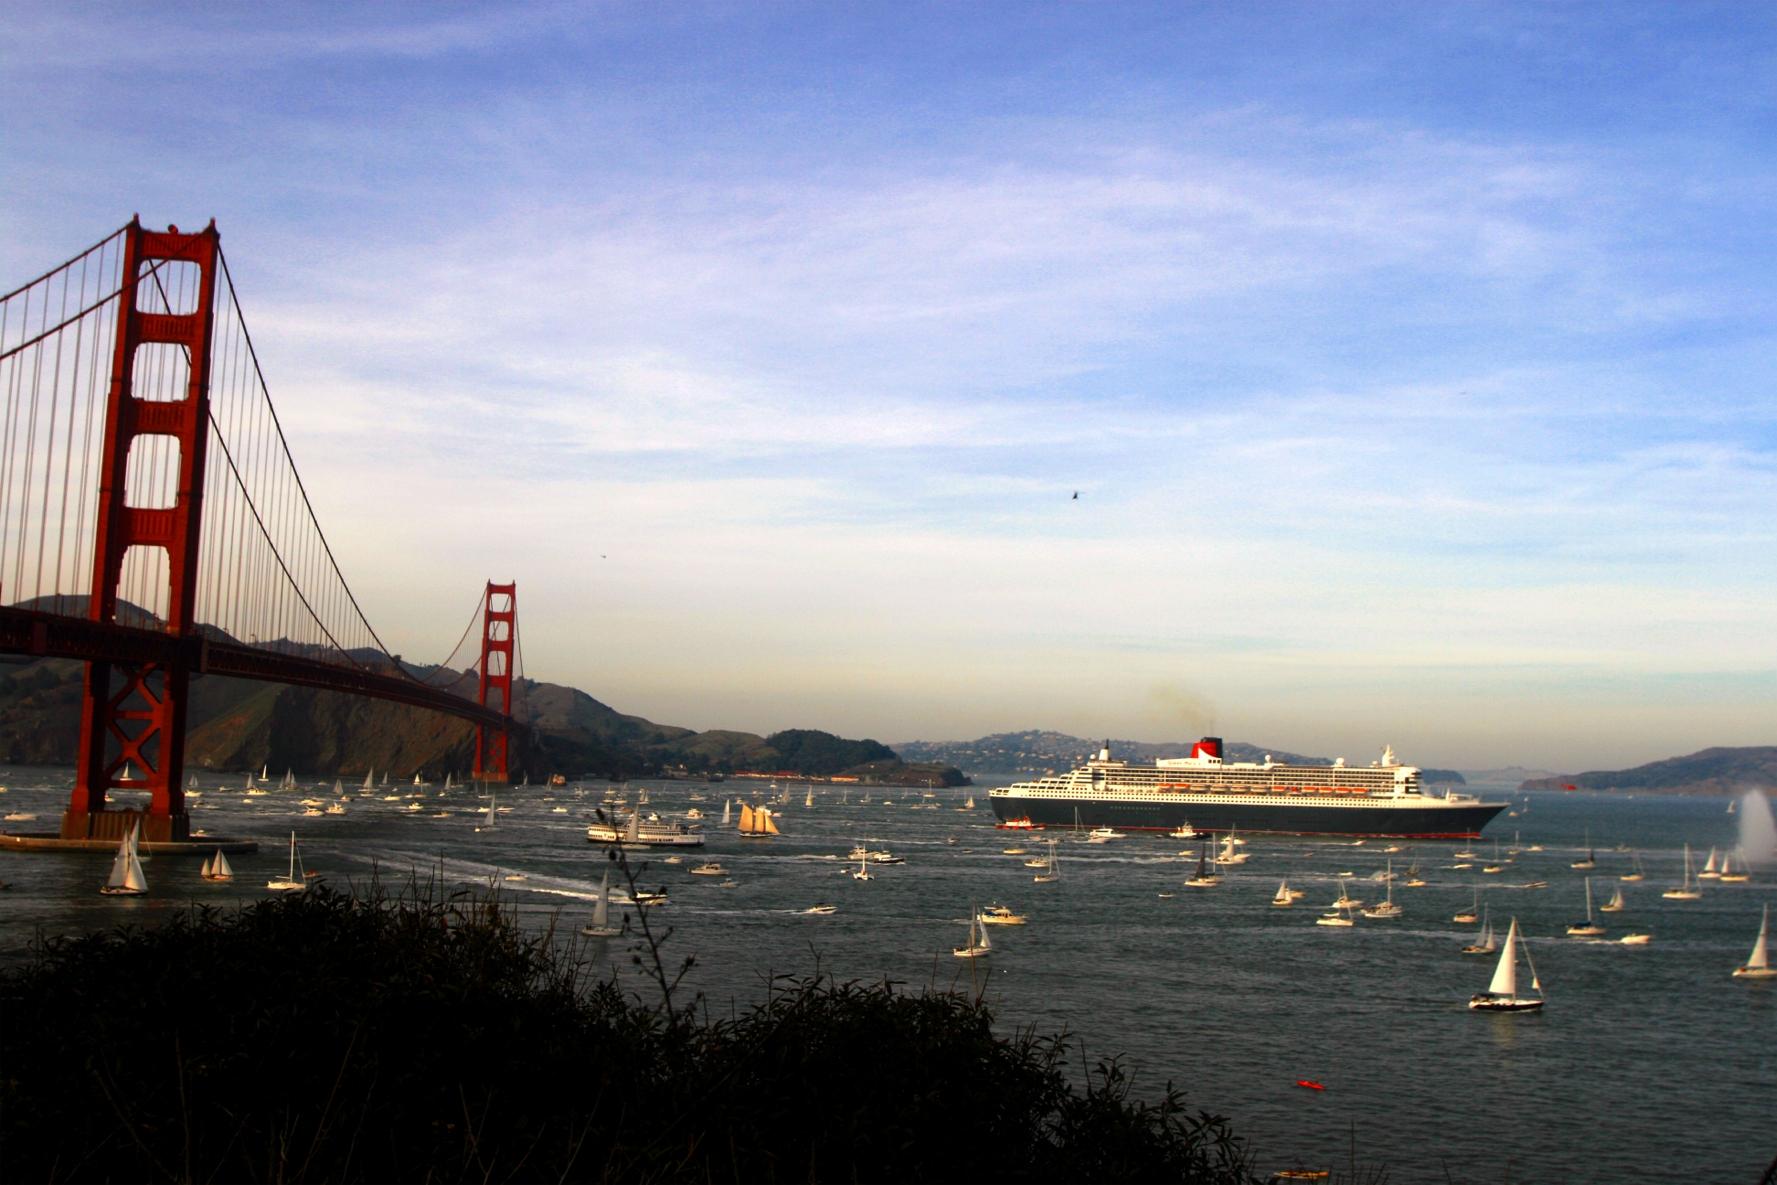 Queen Mary 2 enters San Francisco Bay in 2007.